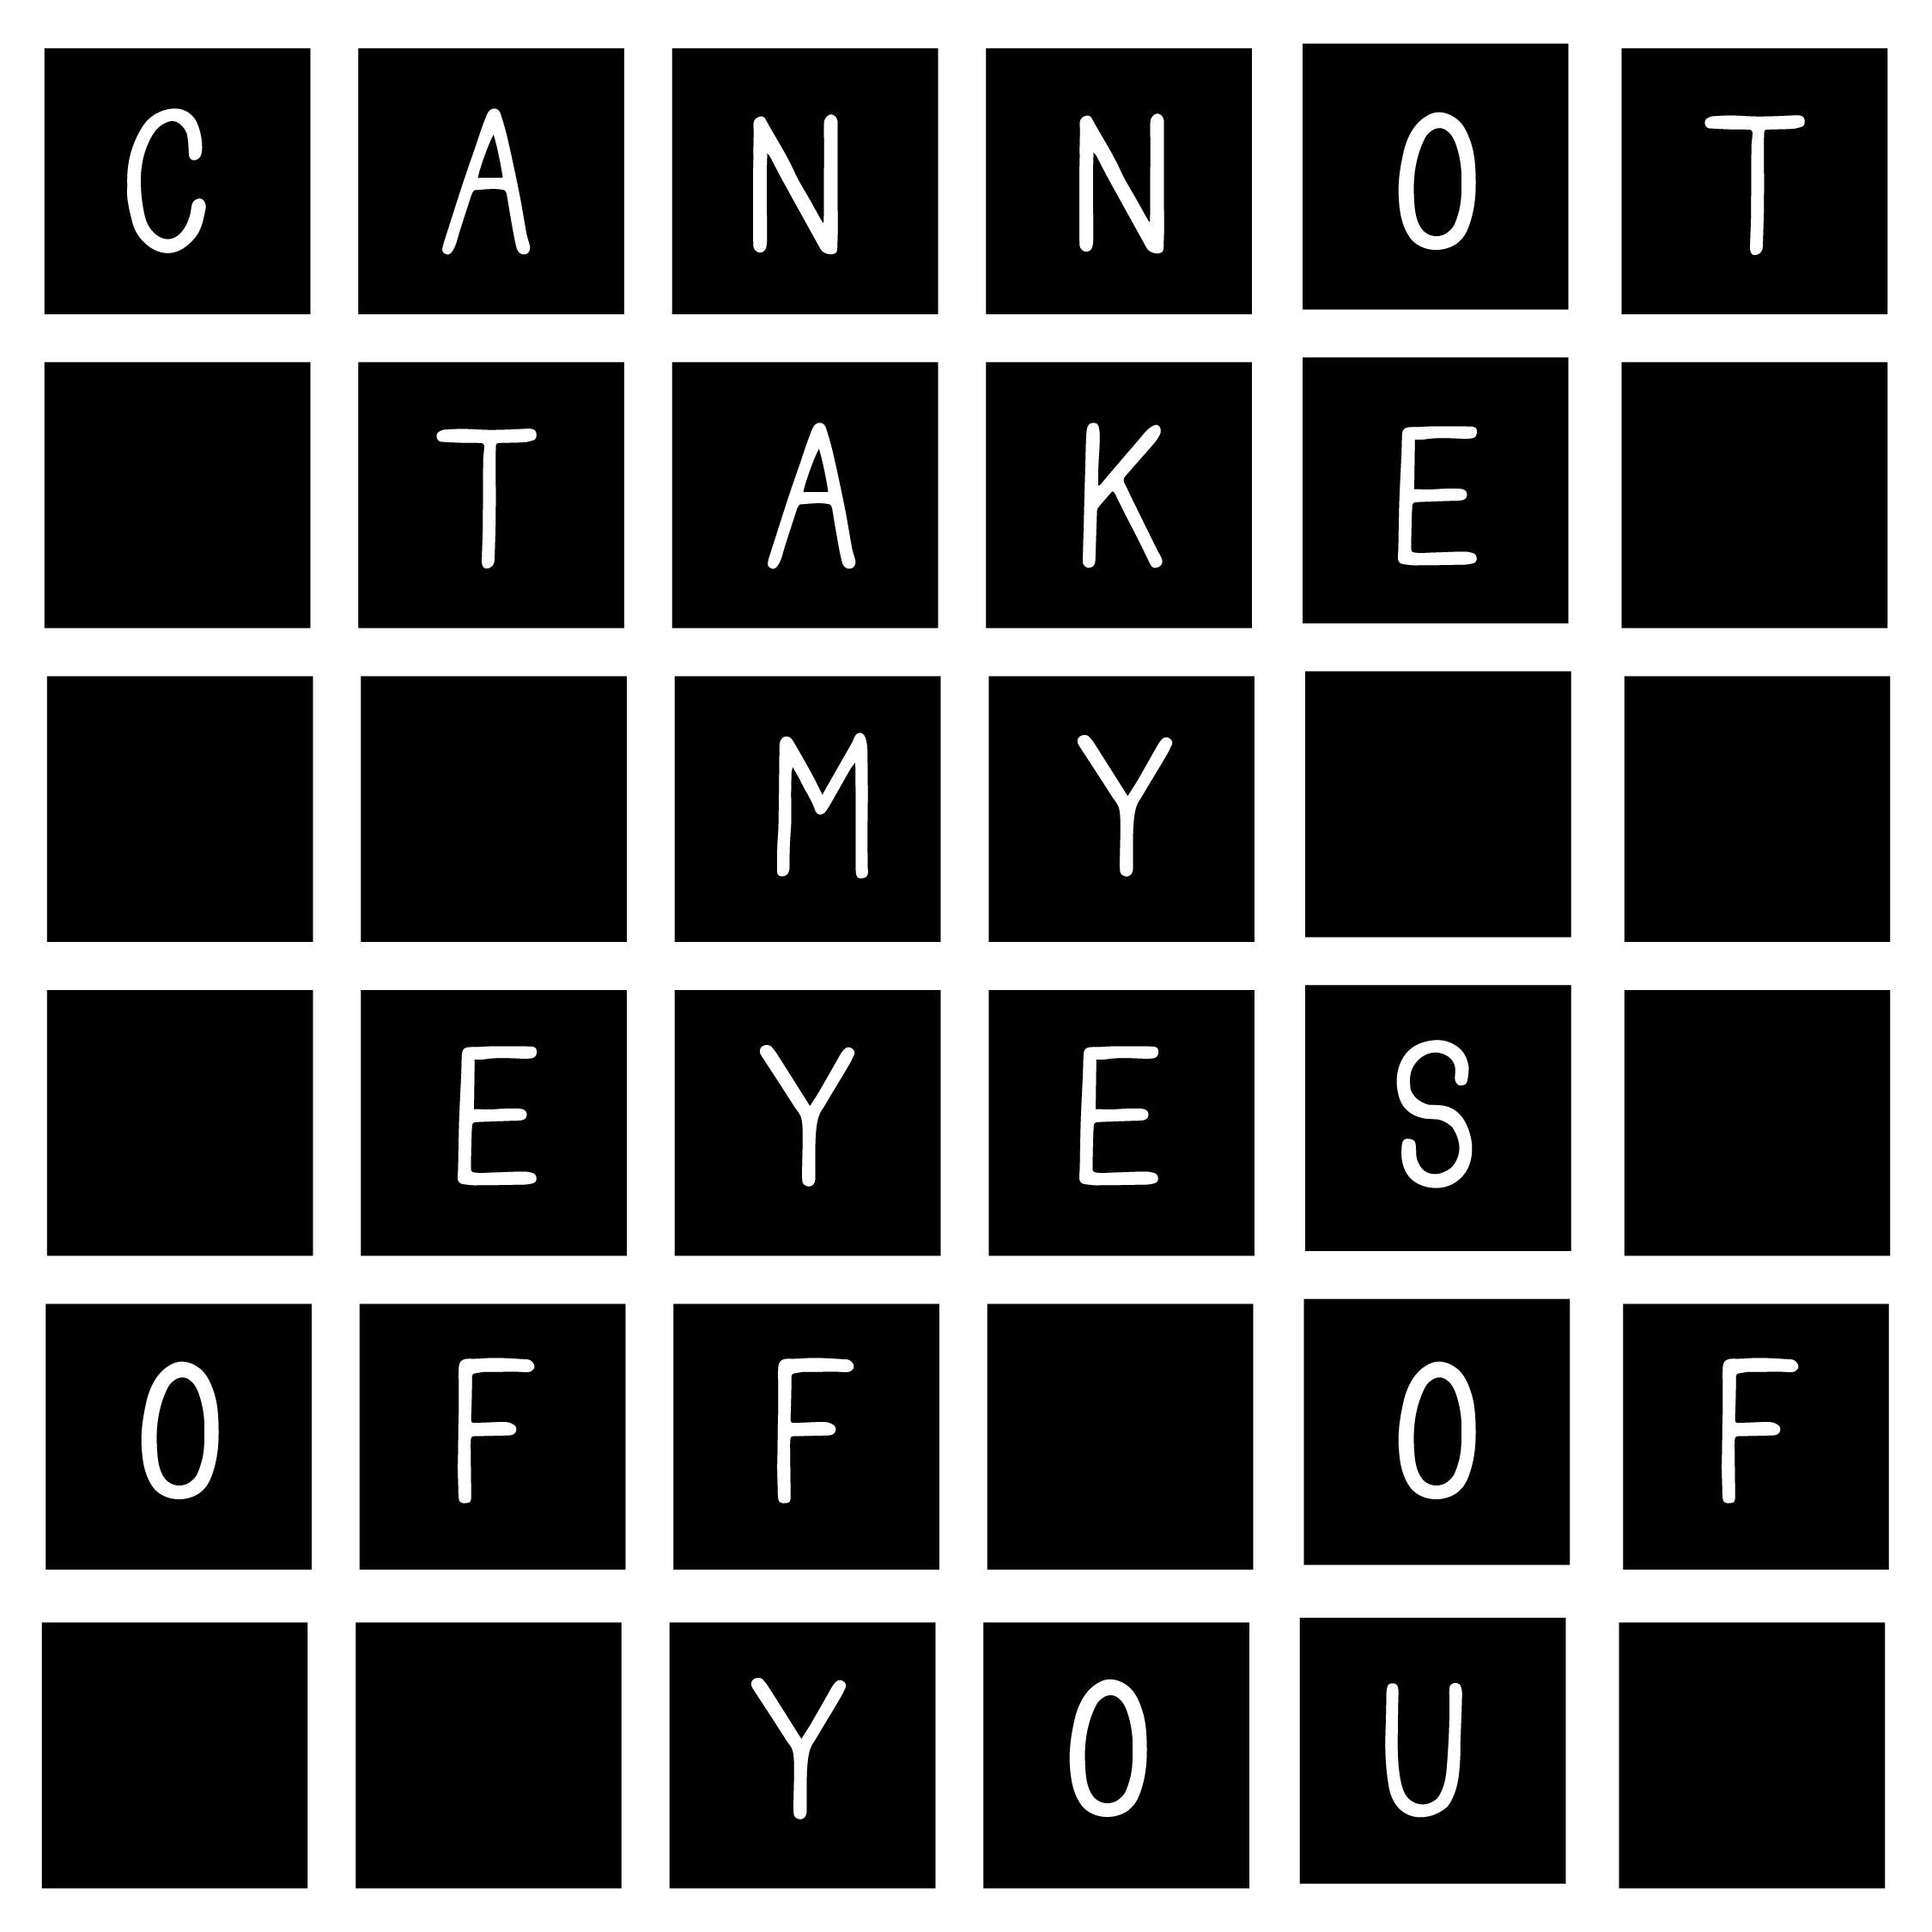 cannottakemyeyesoffofyou-01.jpg